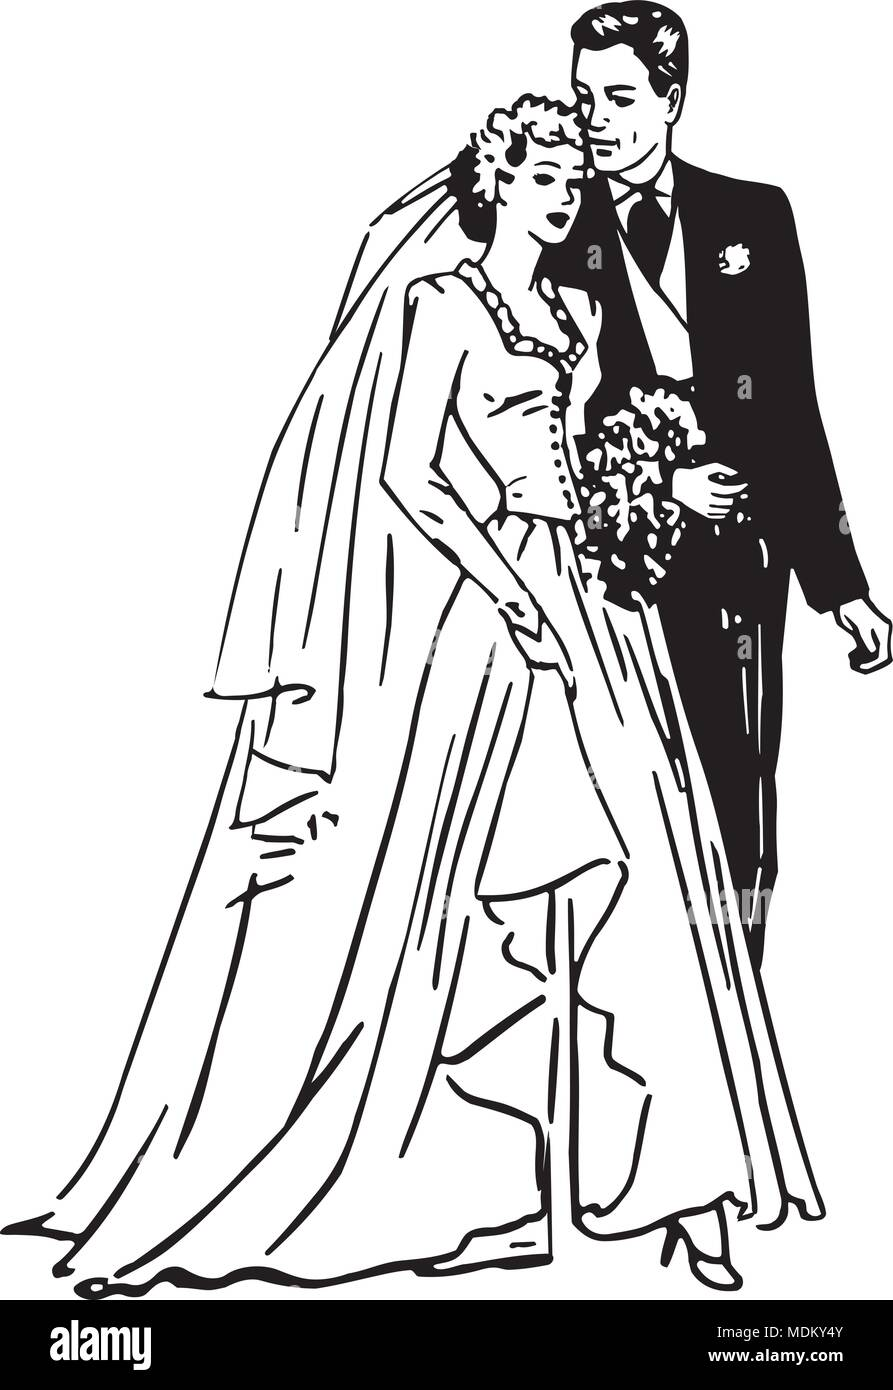 hight resolution of bride and groom retro clipart illustration